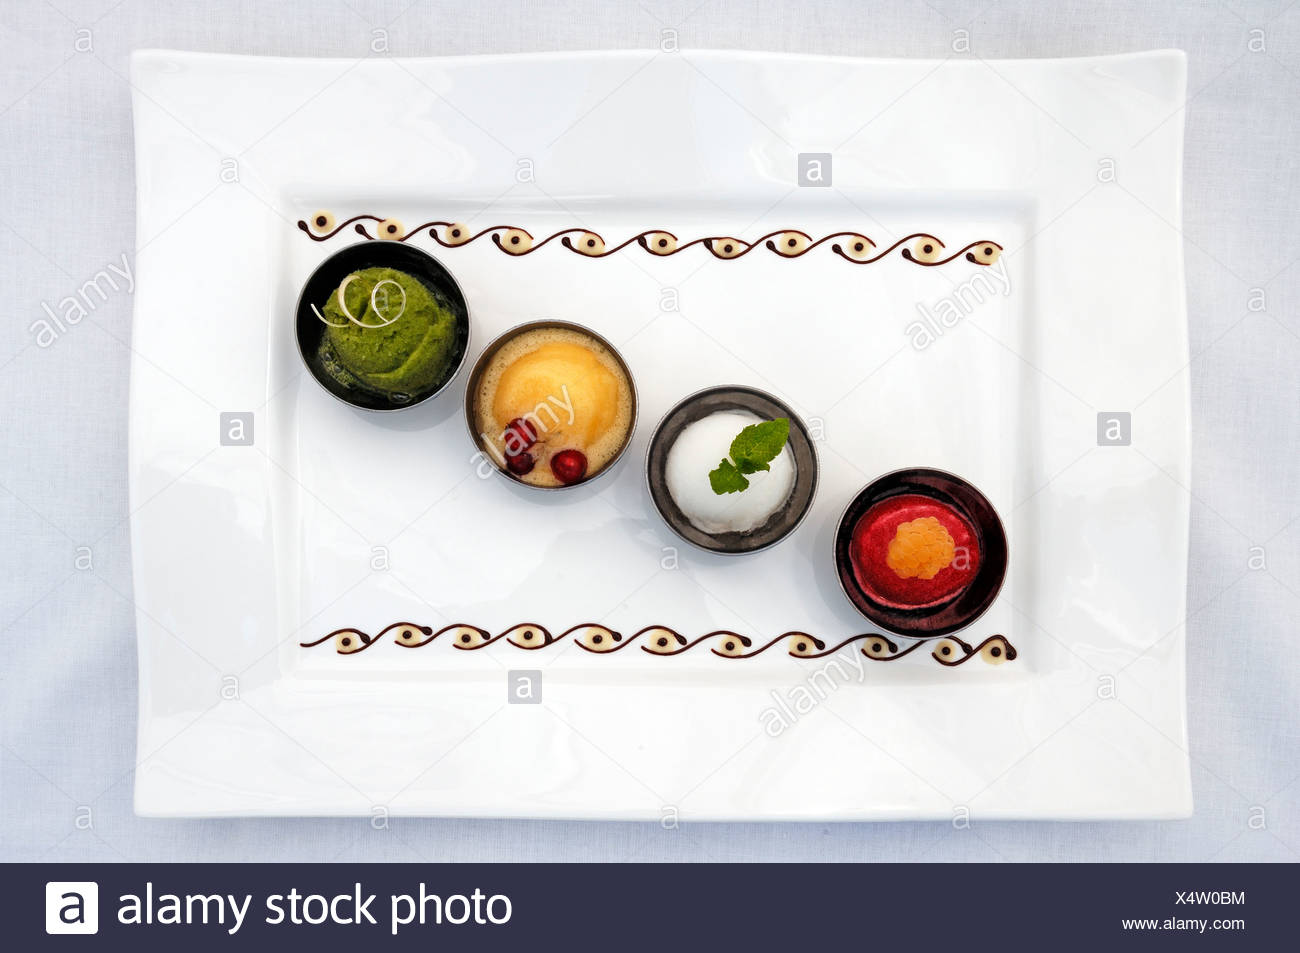 Various sorbets on a white plate, Haute Cuisine, Auberge de la Ferme Hueb, Mike Germershausen, Marckolsheim, Alsace, France - Stock Image